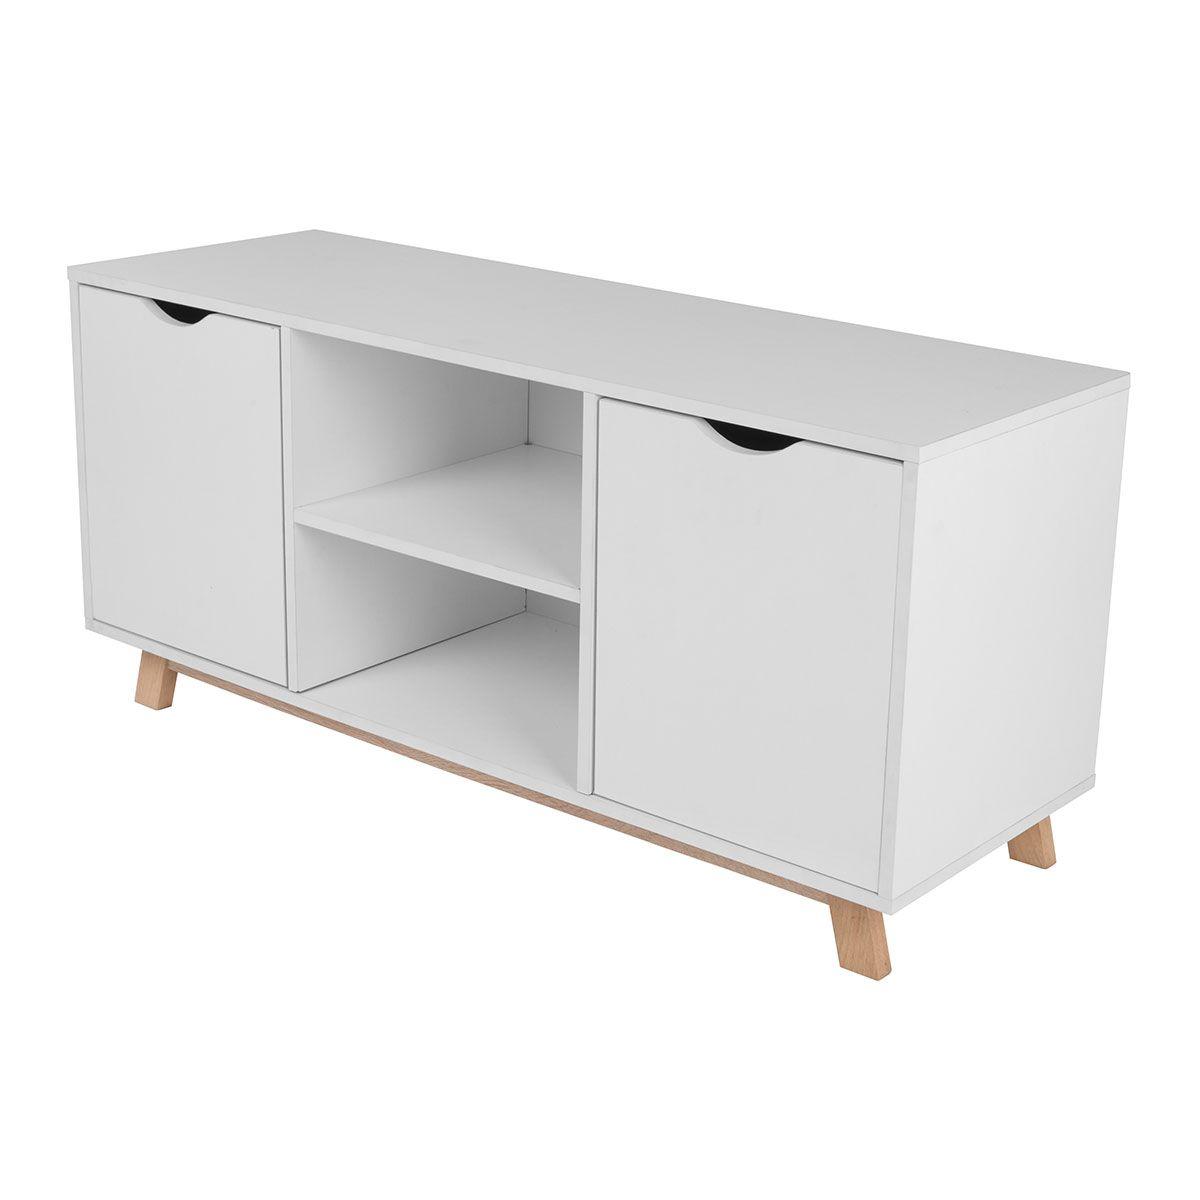 Lowboard channel tv table sideboard tv cabinet tv wardrobe for Sideboard lowboard